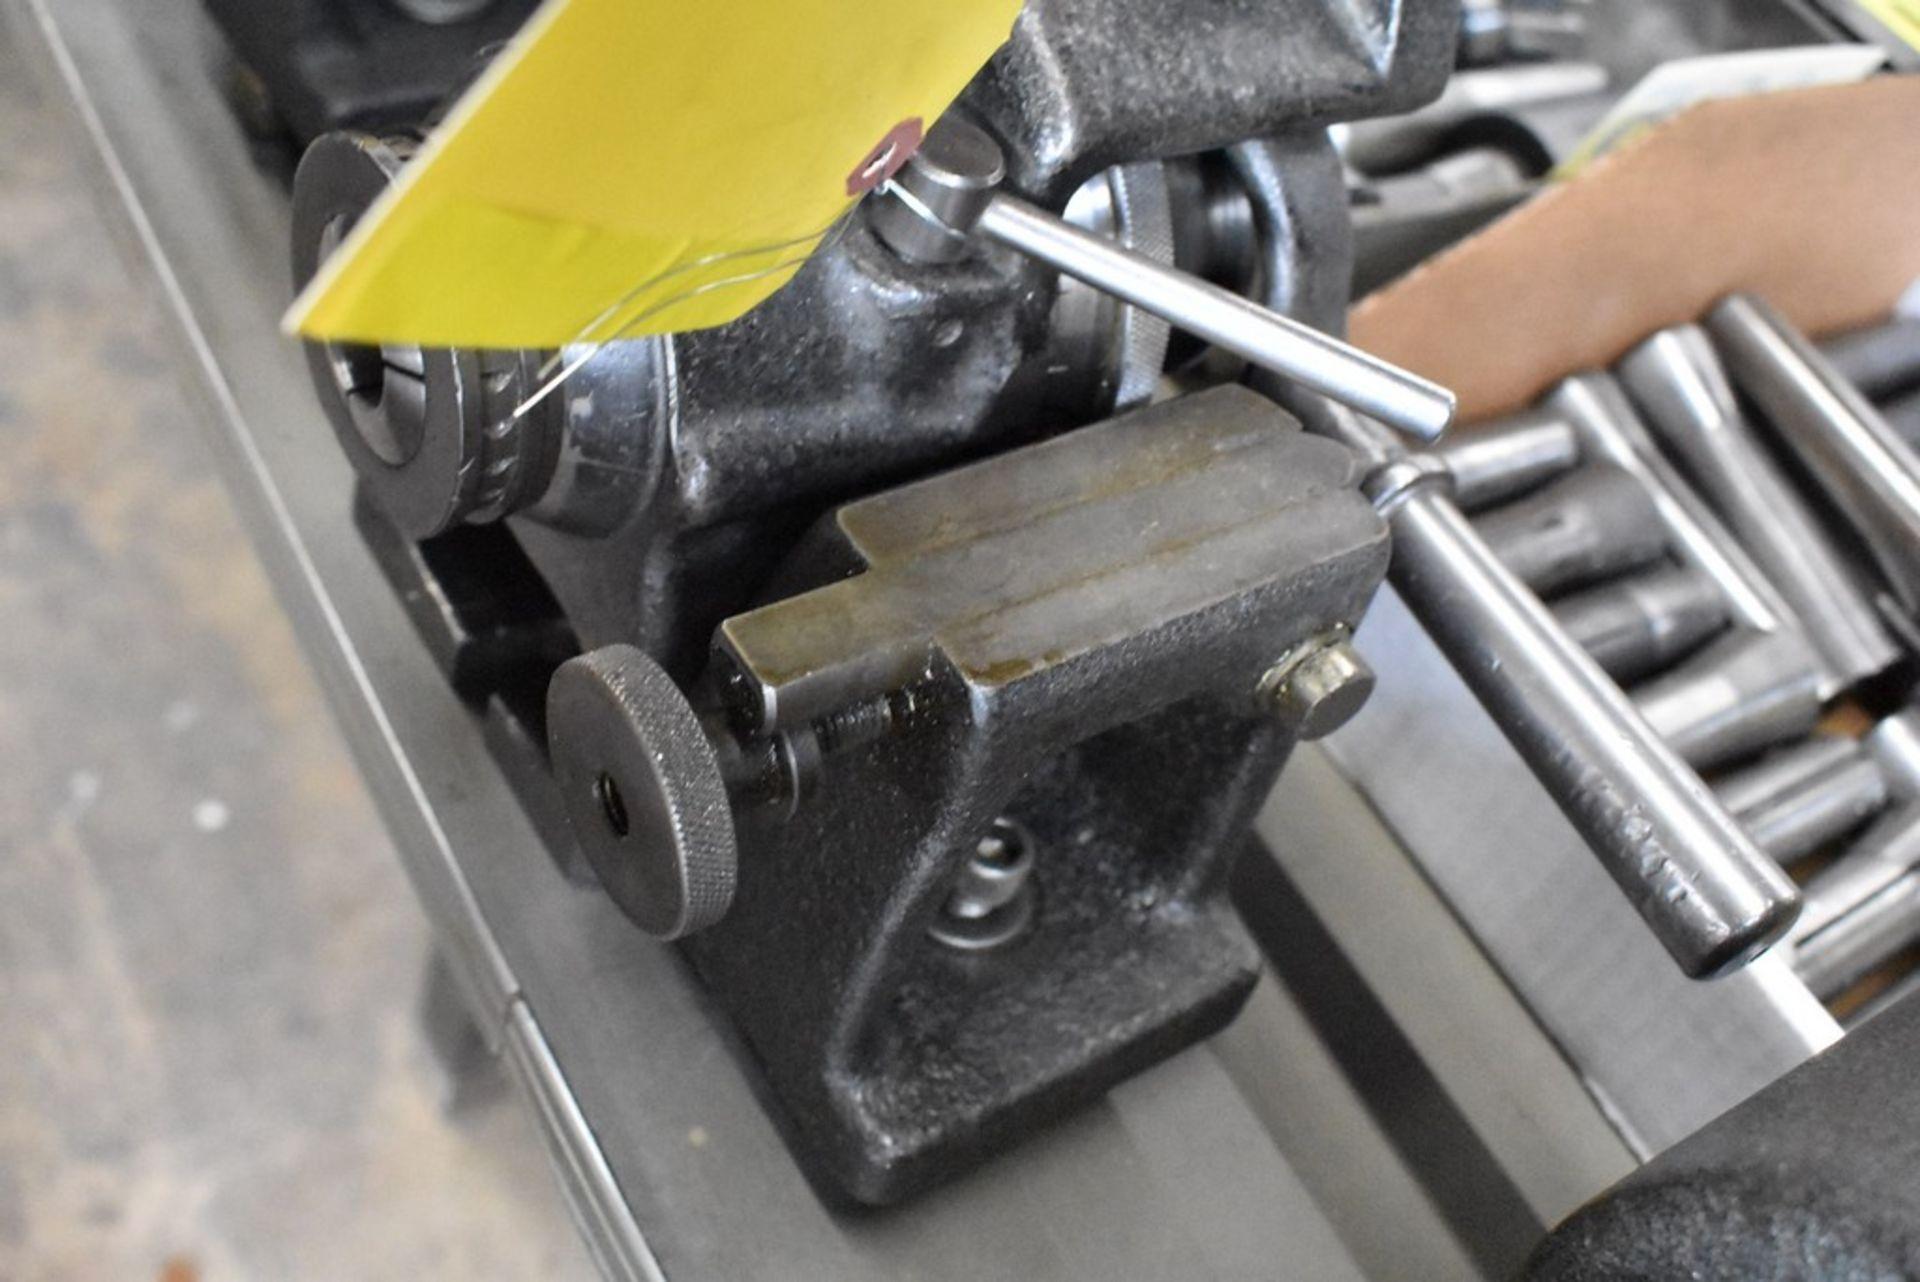 HARDINGE NO. HV-4 5C INDEXER WITH TAIL STOCK - Image 2 of 2